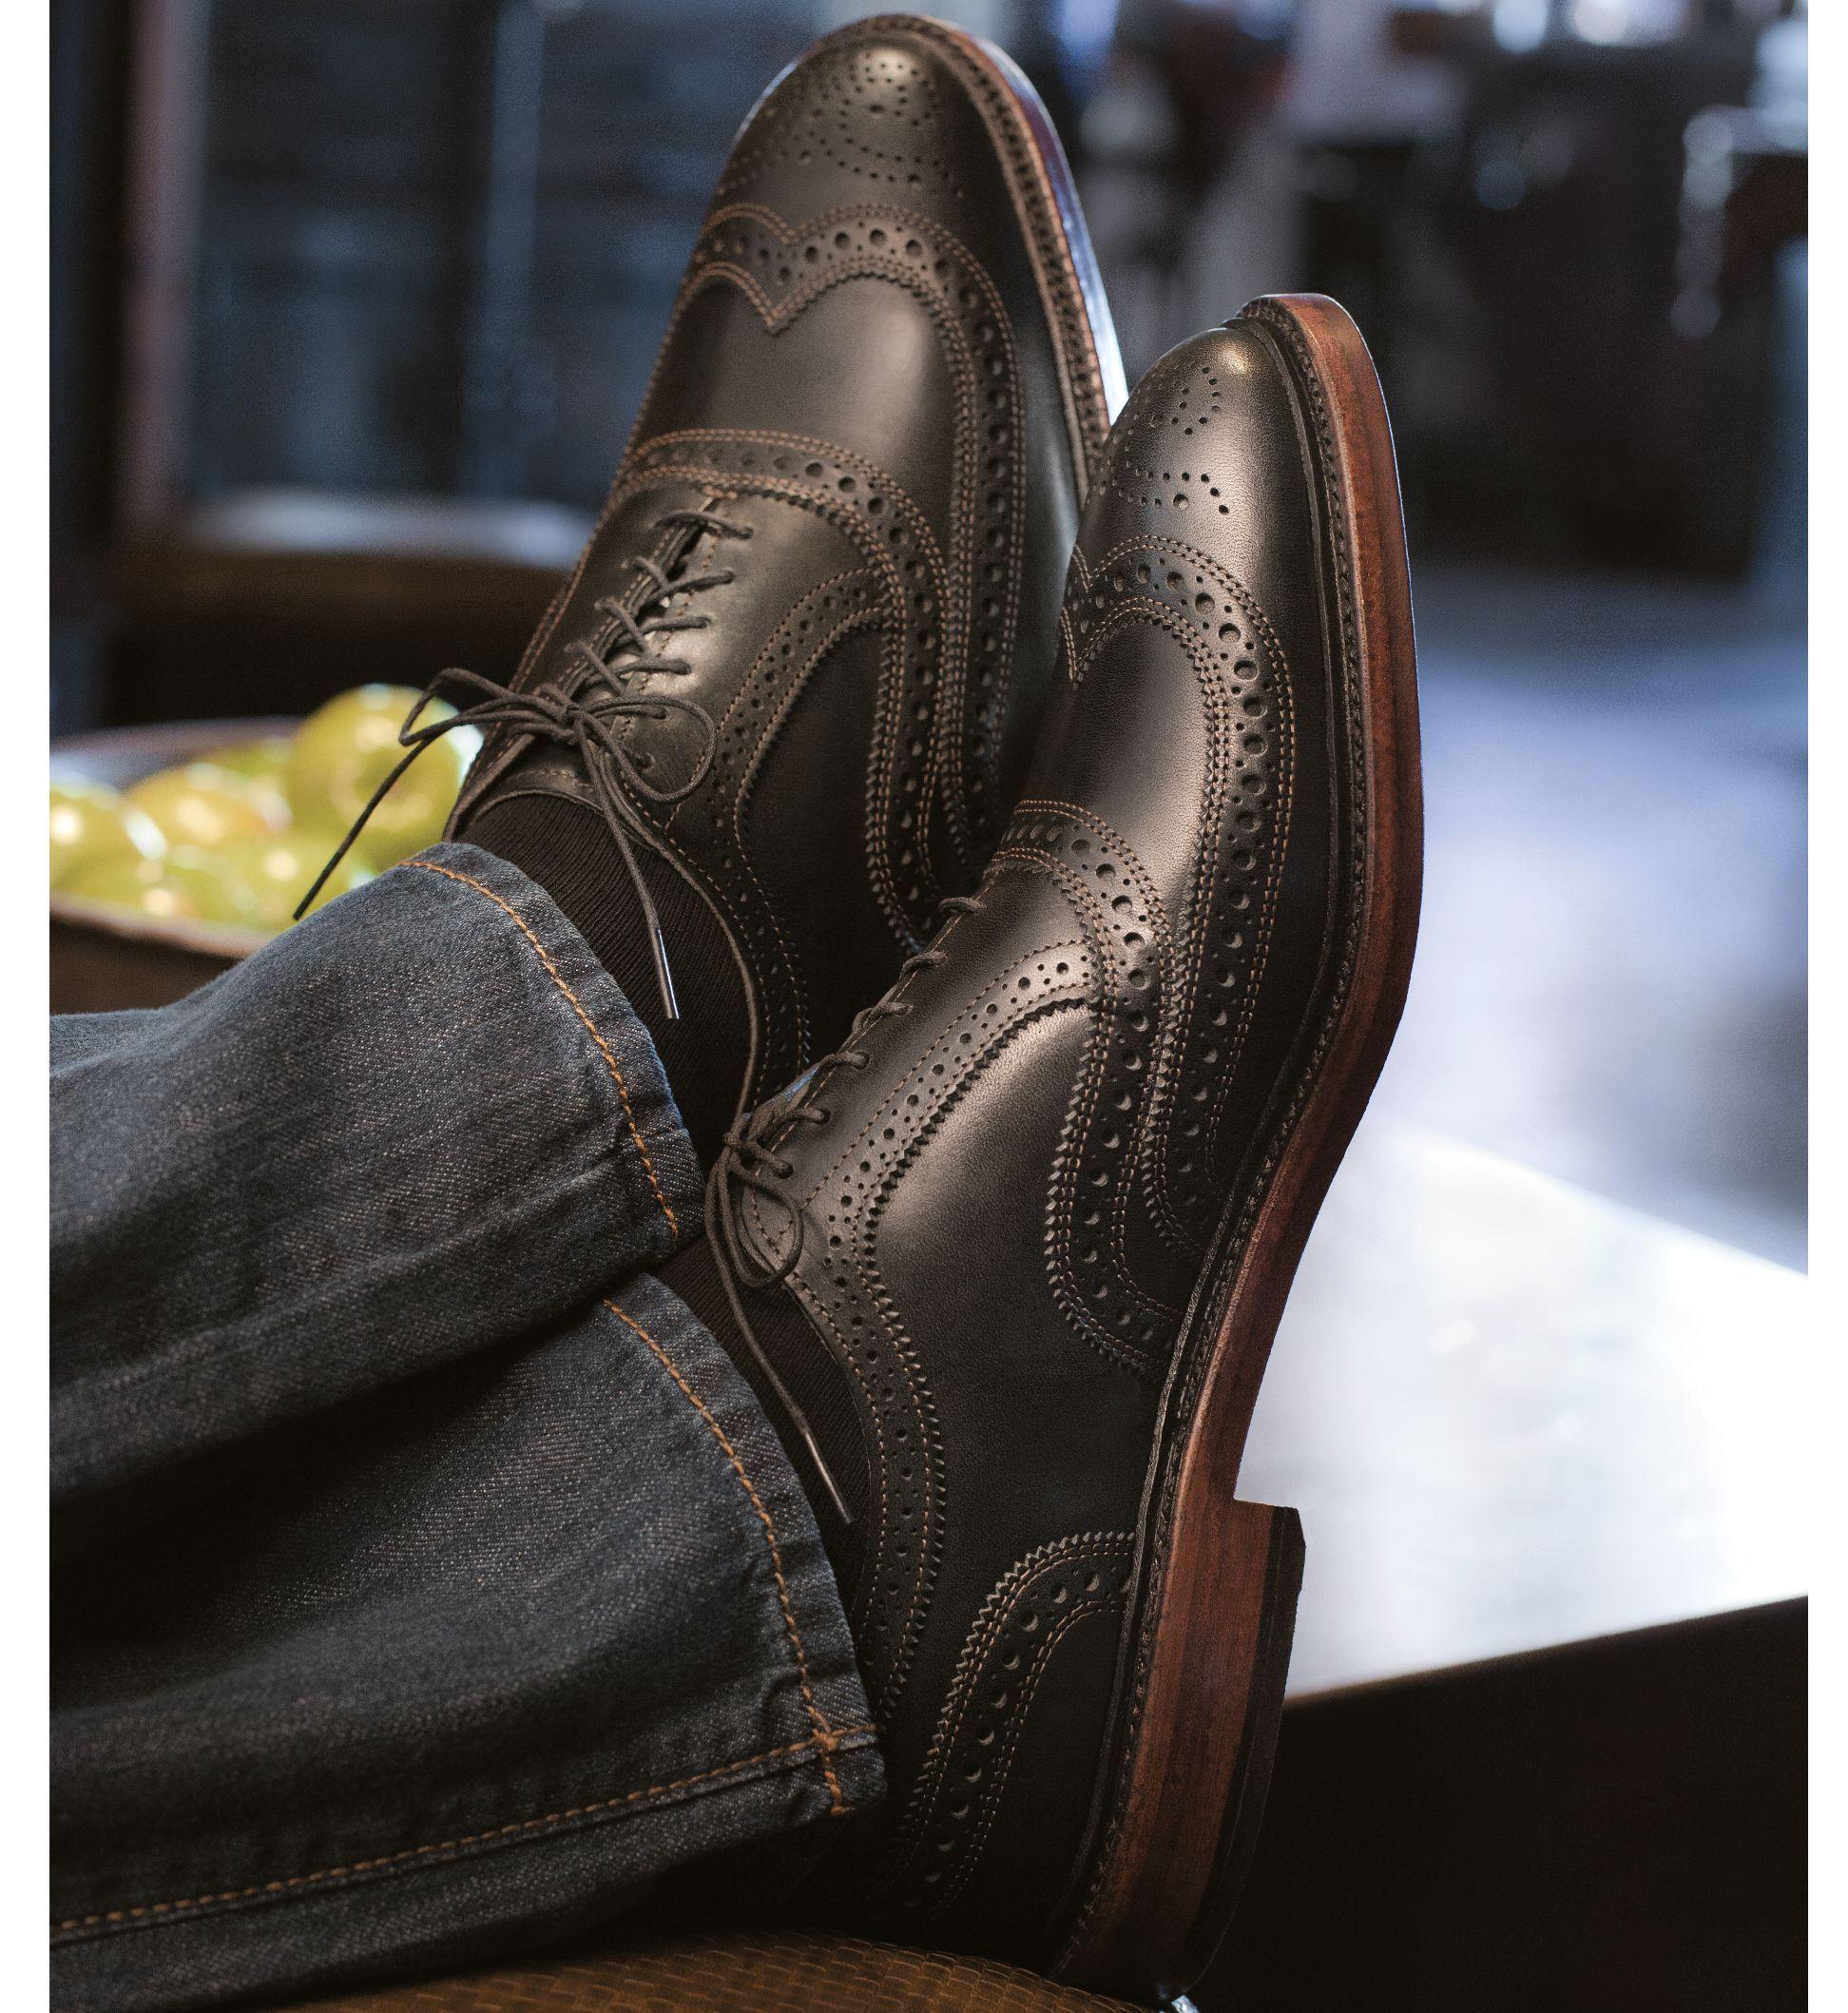 The Allen Edmund McTavish wing tip shoe